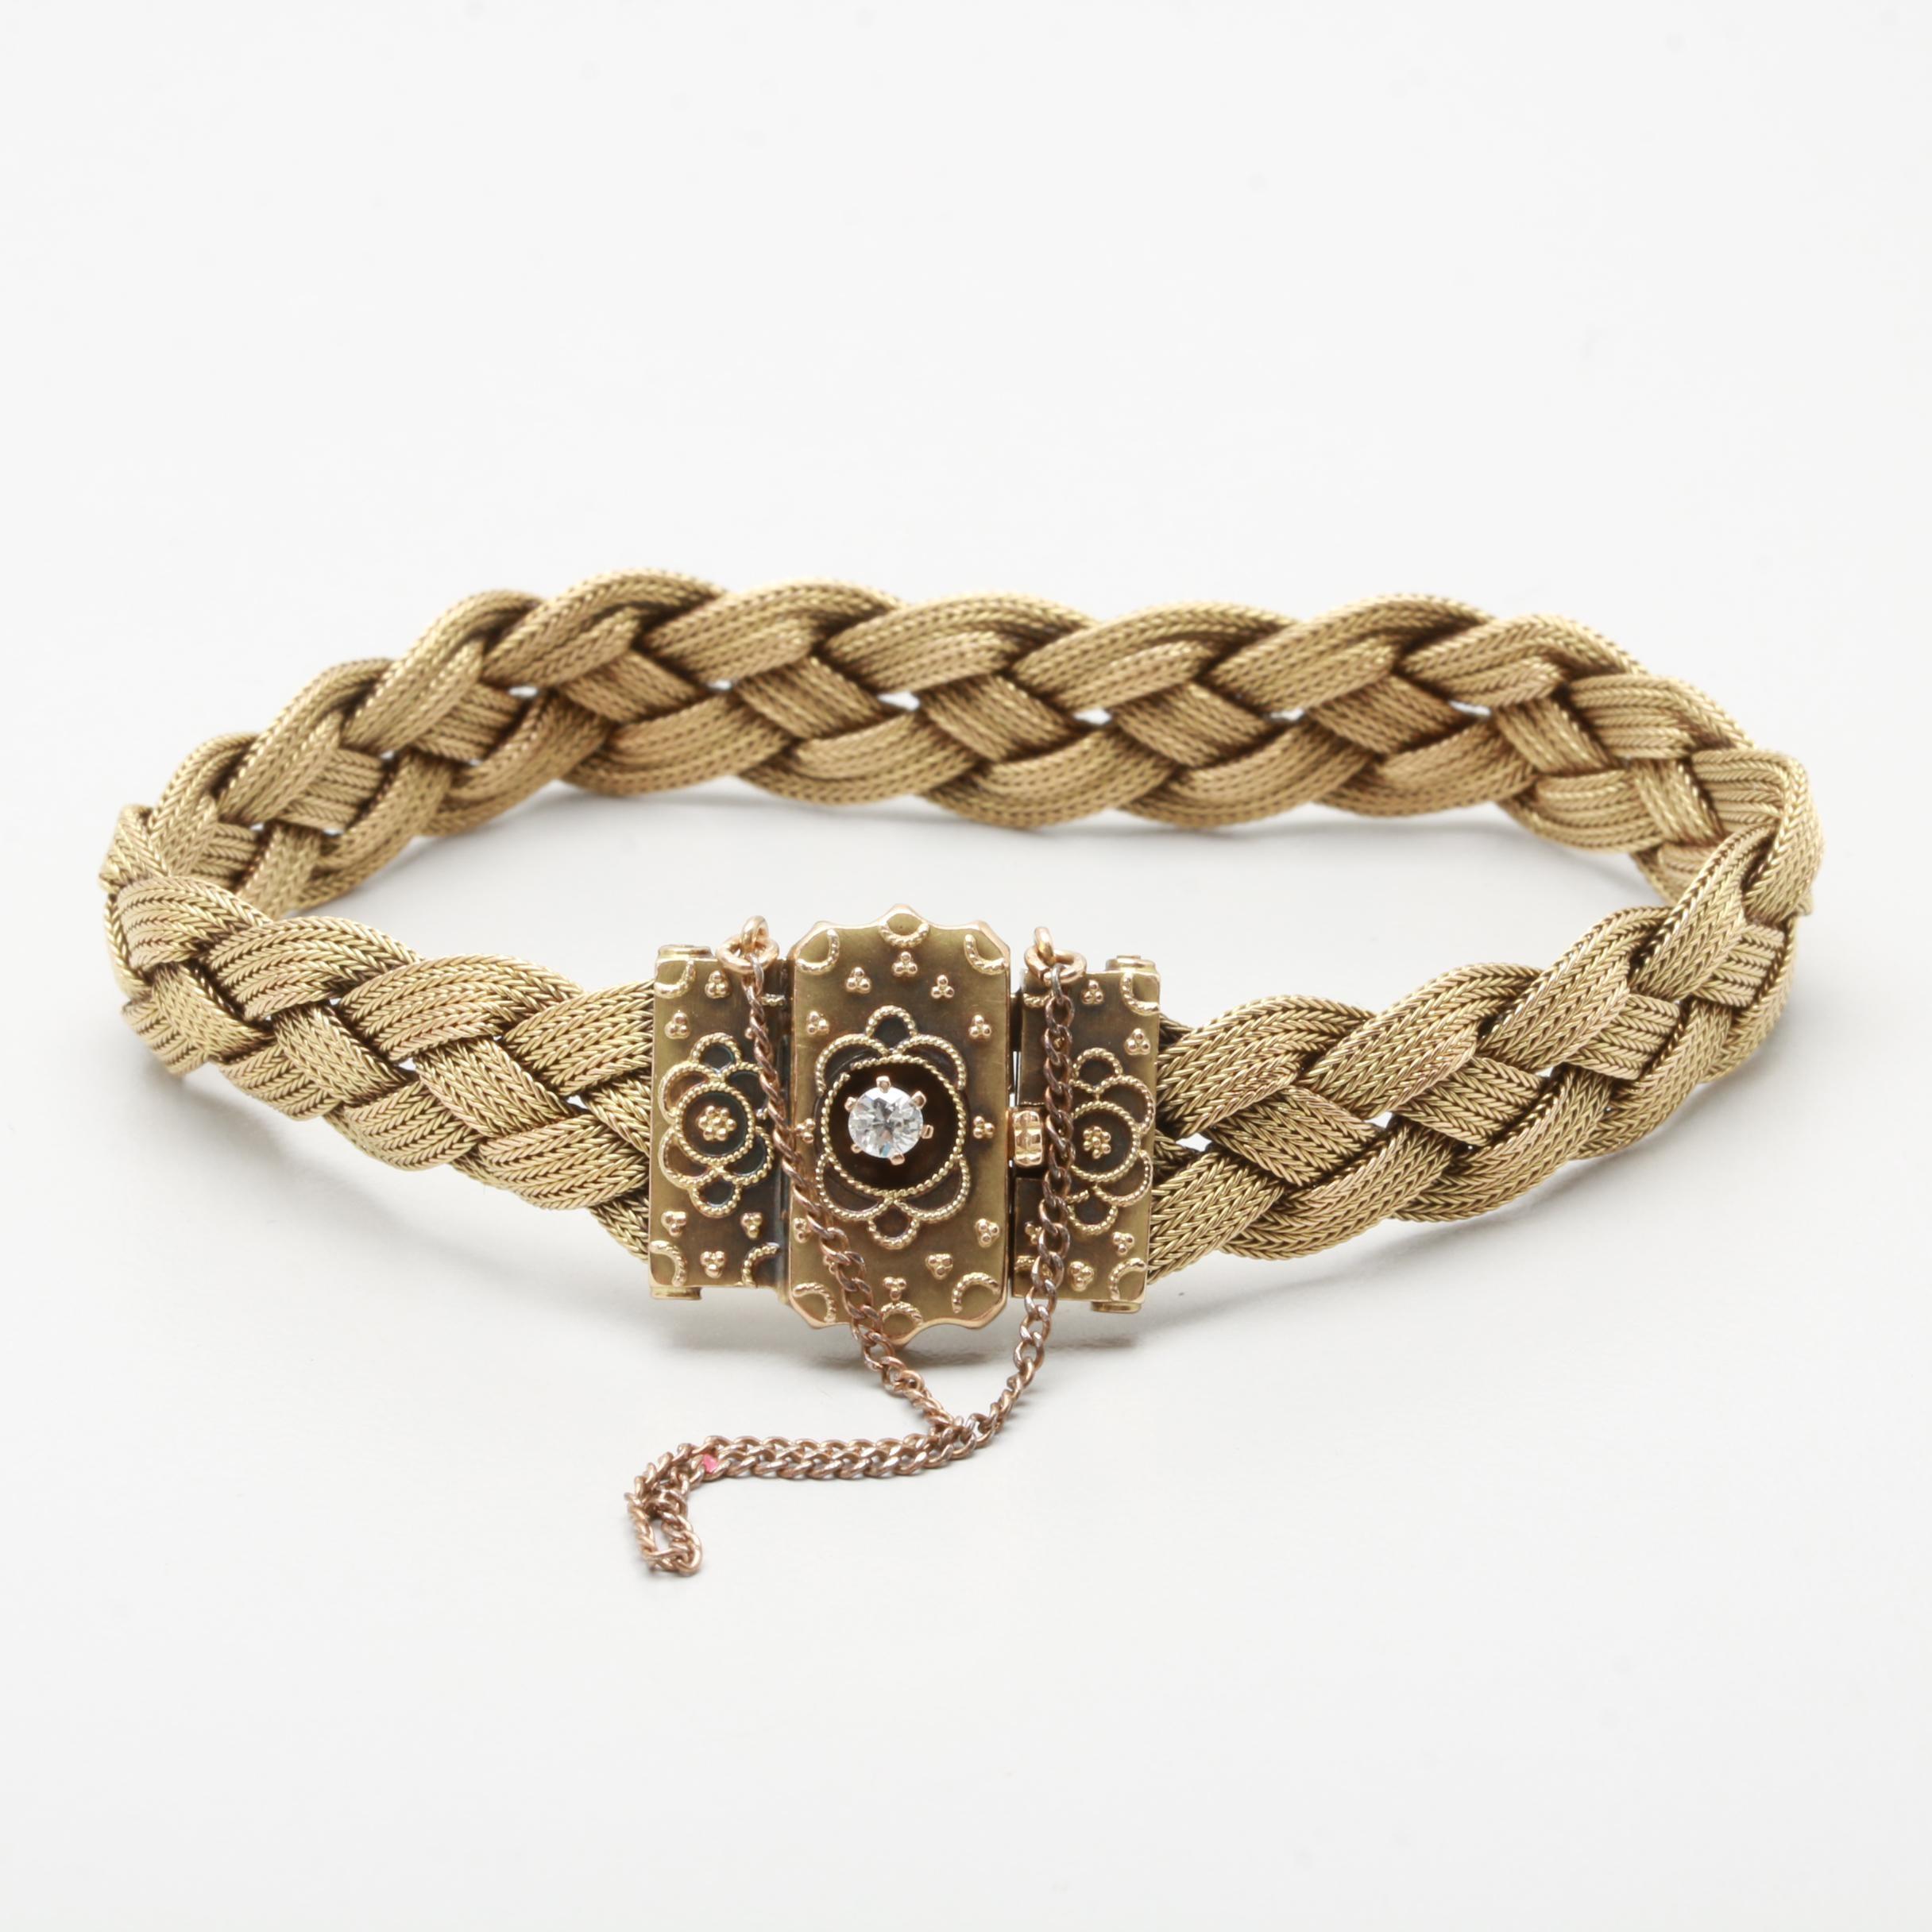 Victorian Braided 14K Yellow Gold and Old European Cut Diamond Bracelet